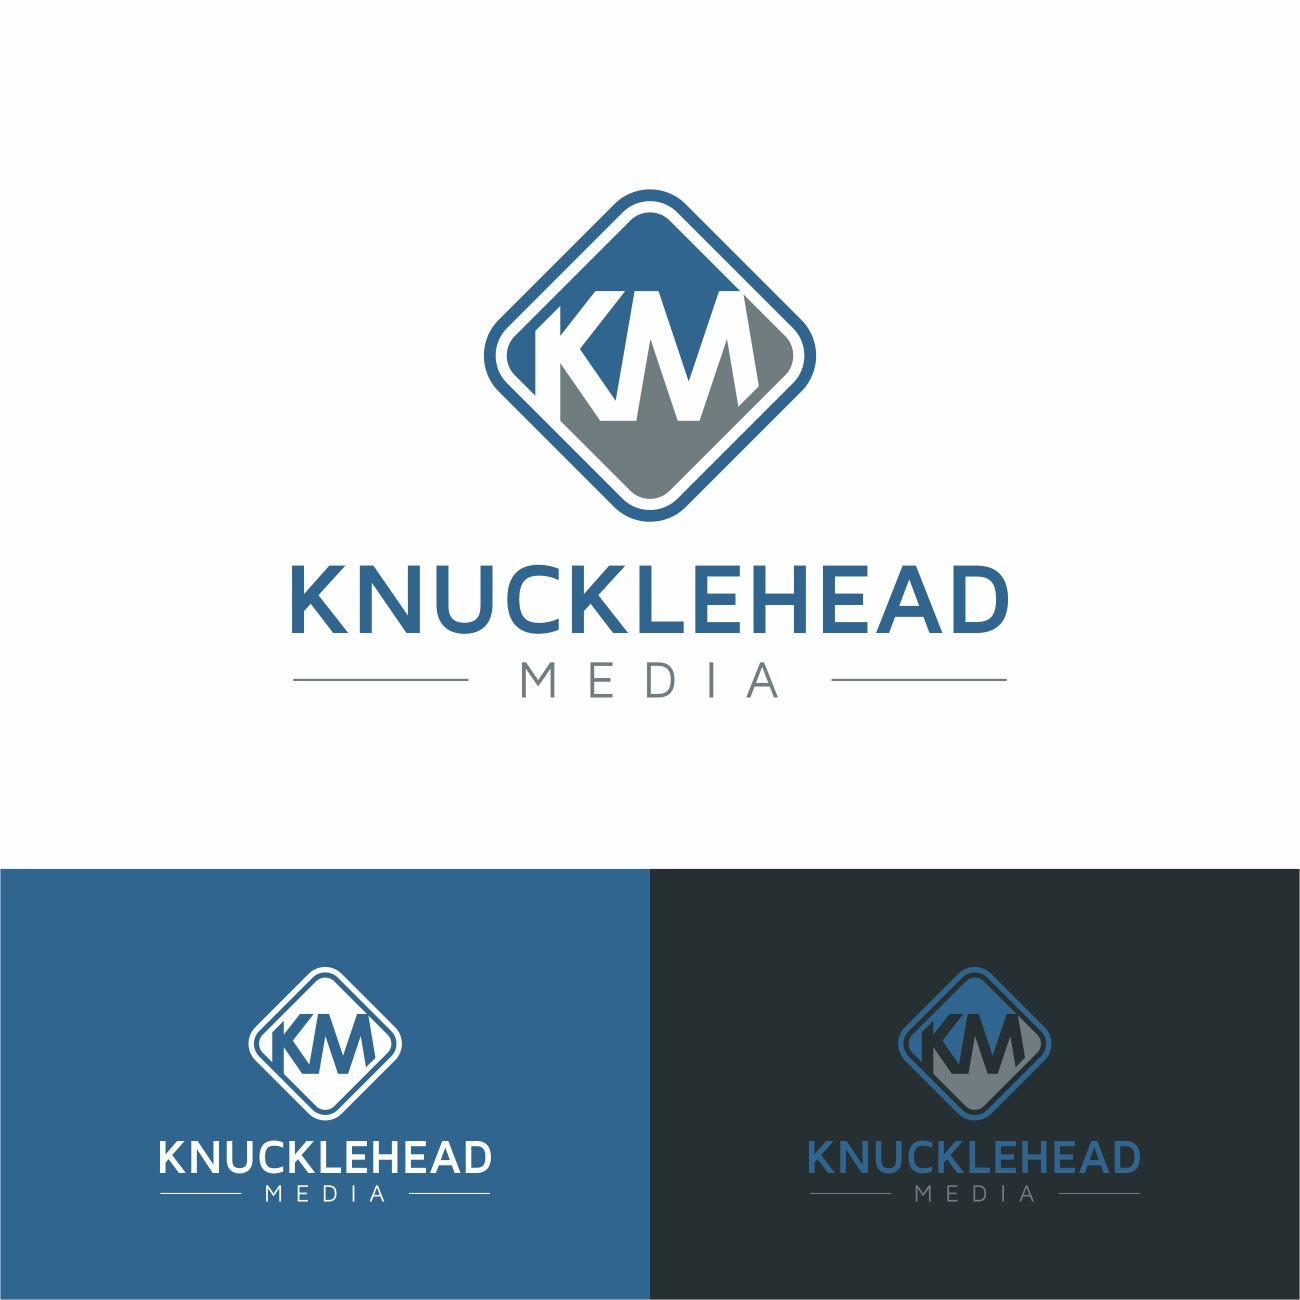 Logo Design by RasYa Muhammad Athaya - Entry No. 25 in the Logo Design Contest Imaginative Logo Design for knucklehead media.